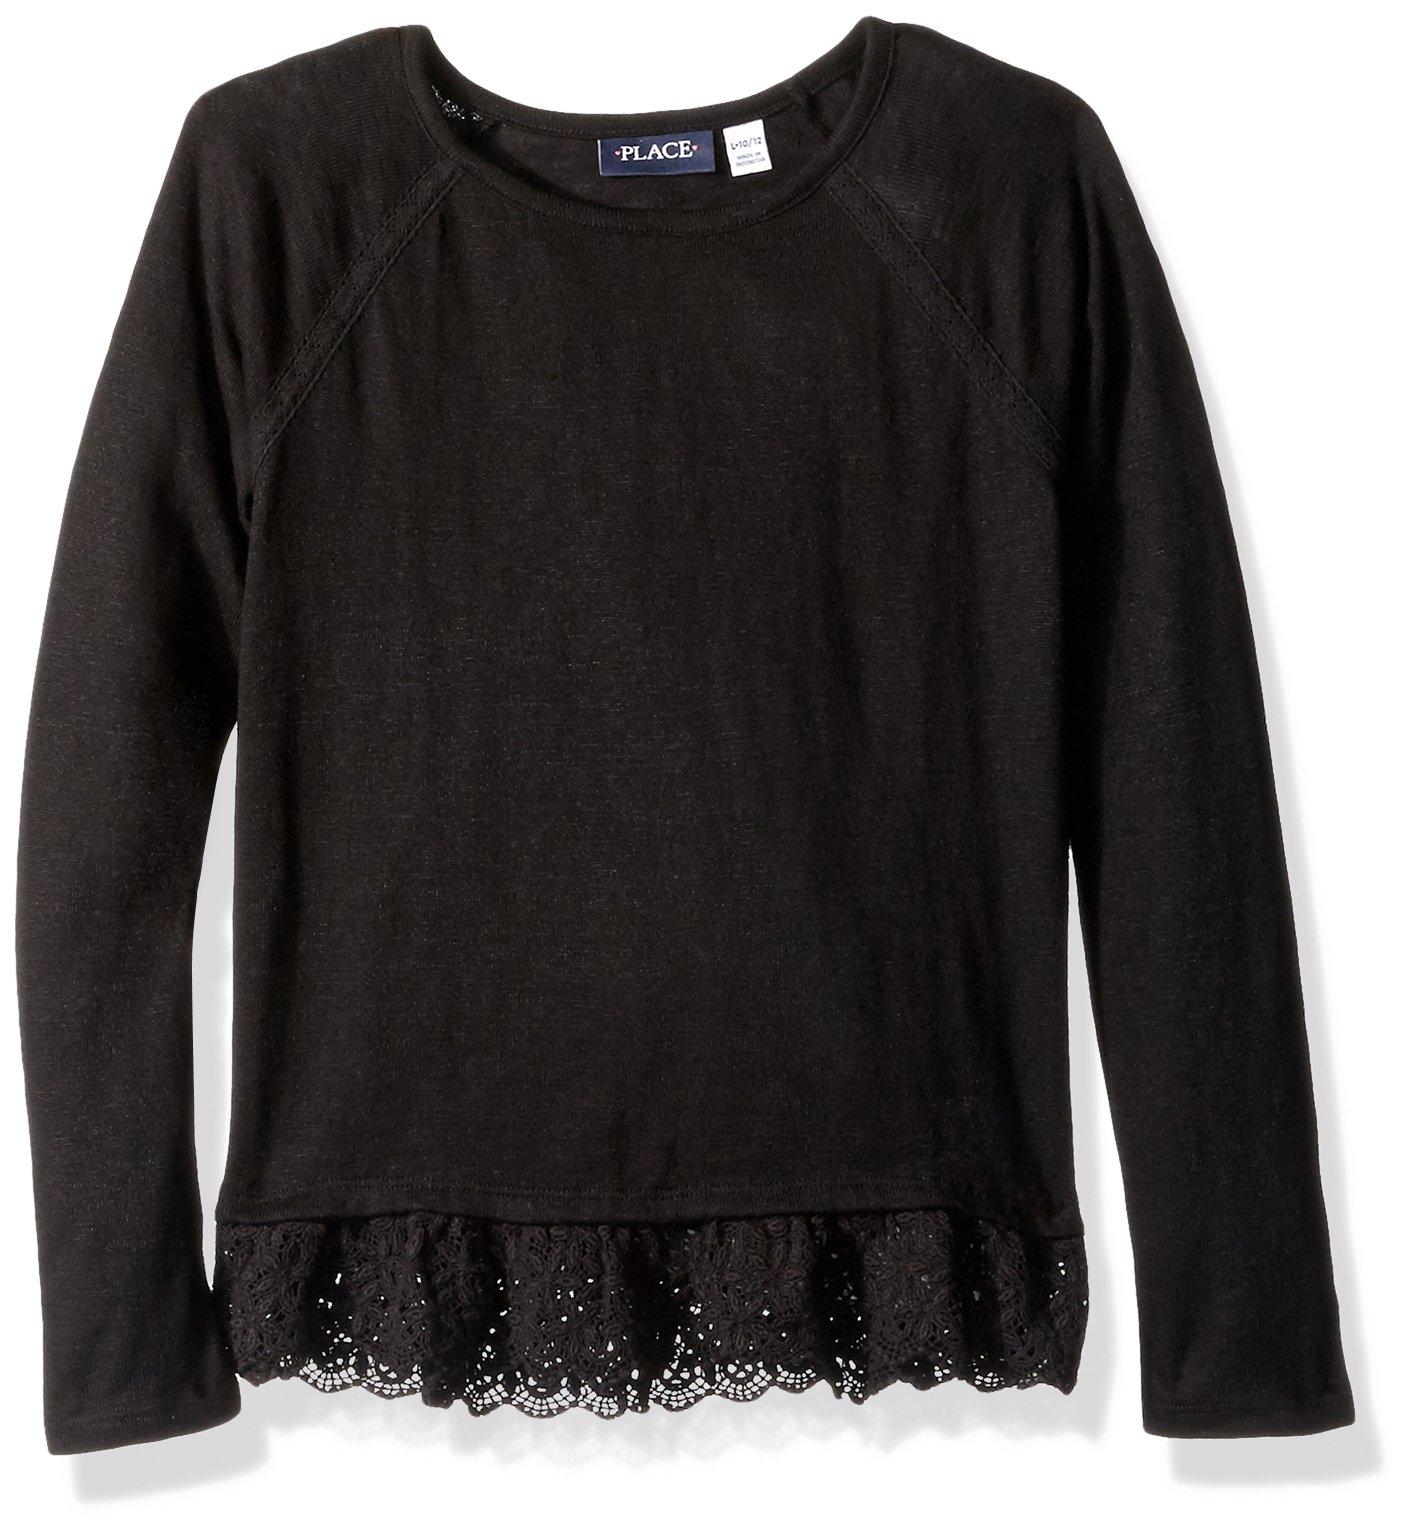 The Children's Place Big Girls' Sweater 2, Black 86301, XL (14)